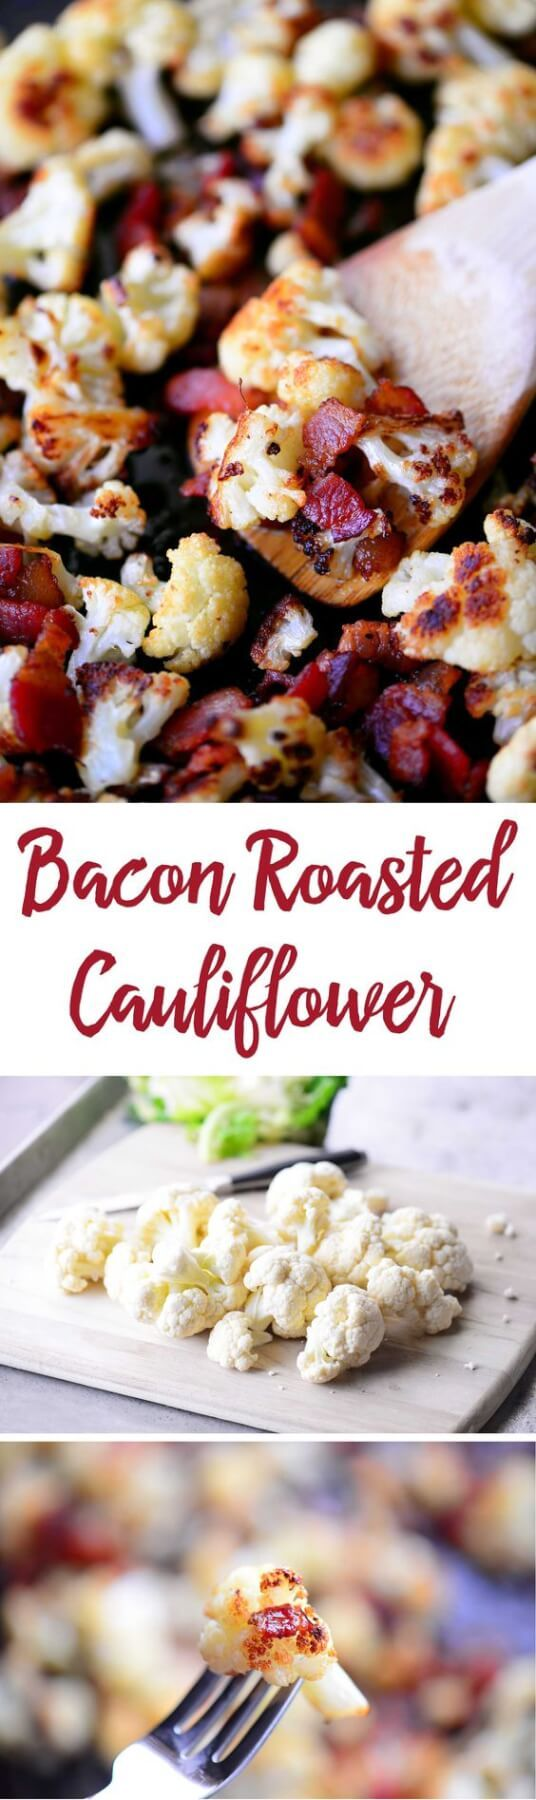 9 Paleo Bacon Recipes Plus Paleo Bacon Brands to Buy